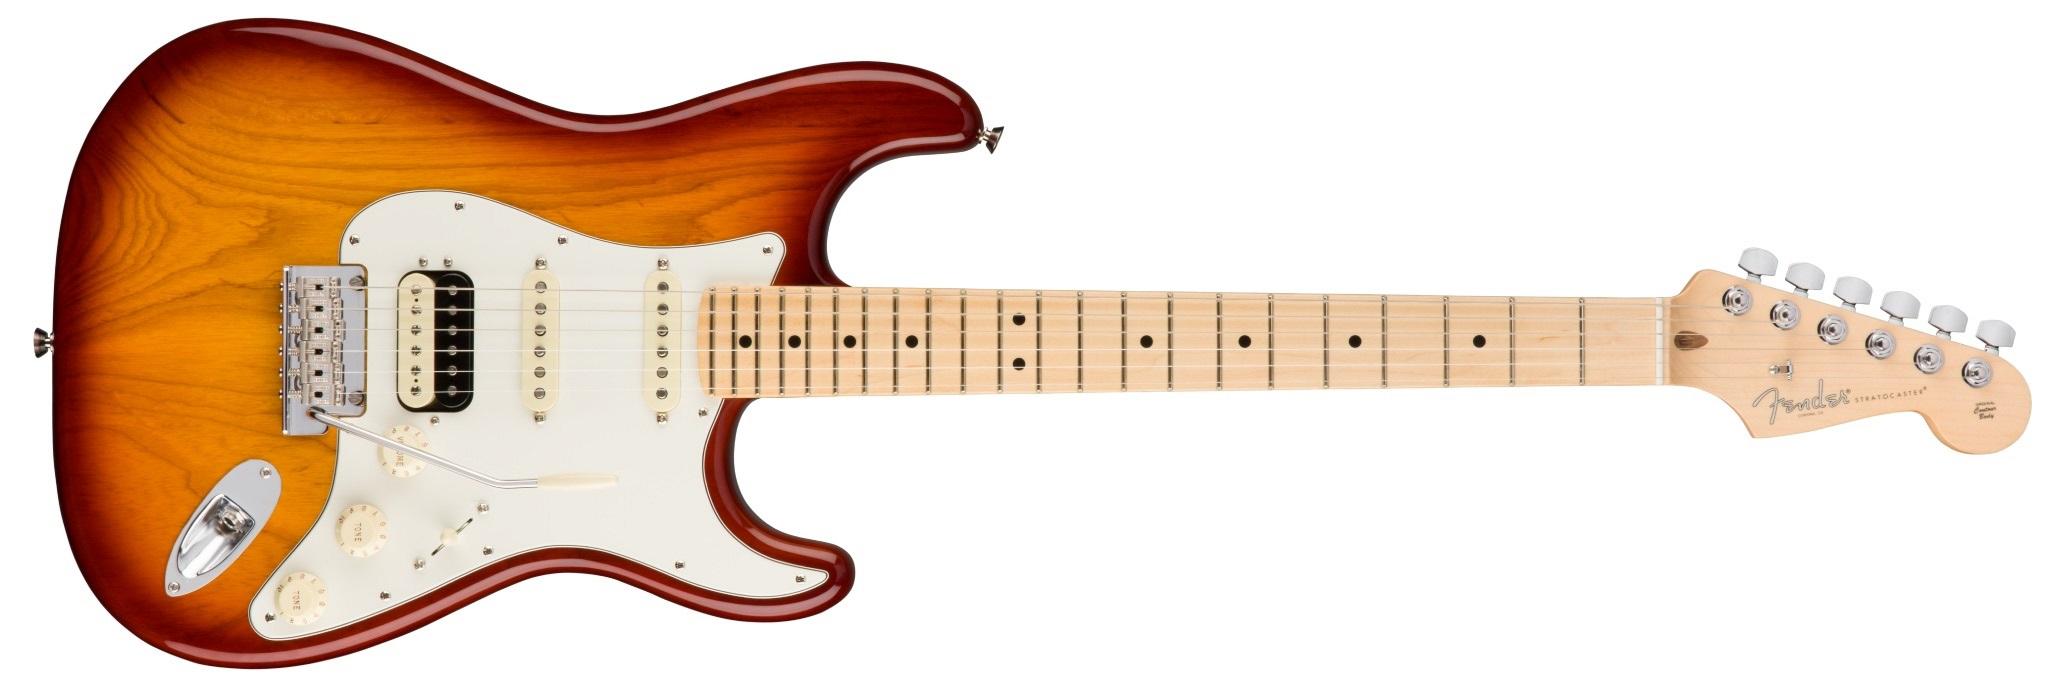 Fender American Pro Stratocaster HSS Shawbuckers MN SSB ASH